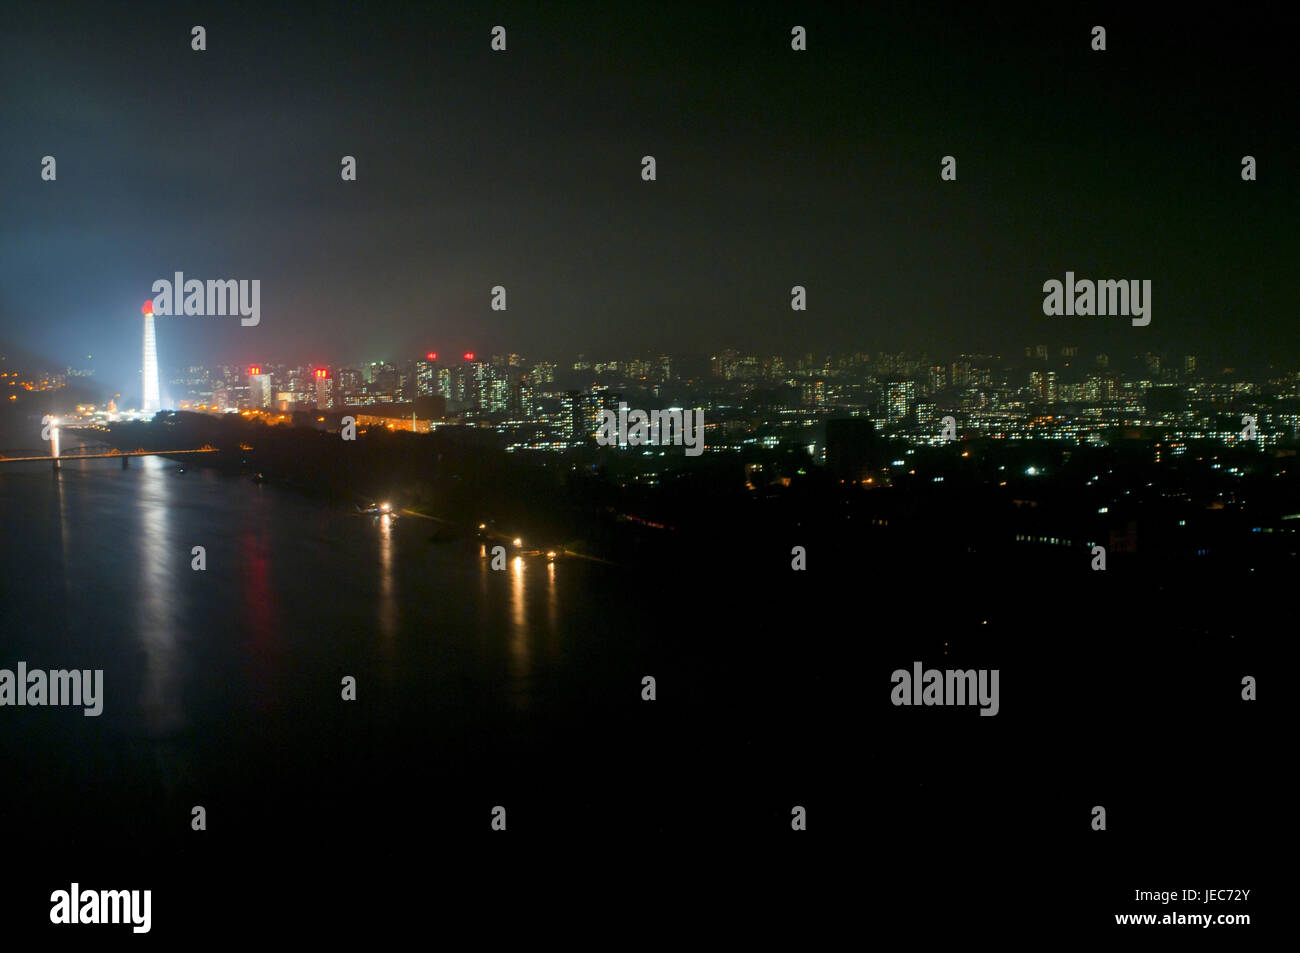 The Juche tower, Pjongjang, North Korea, - Stock Image